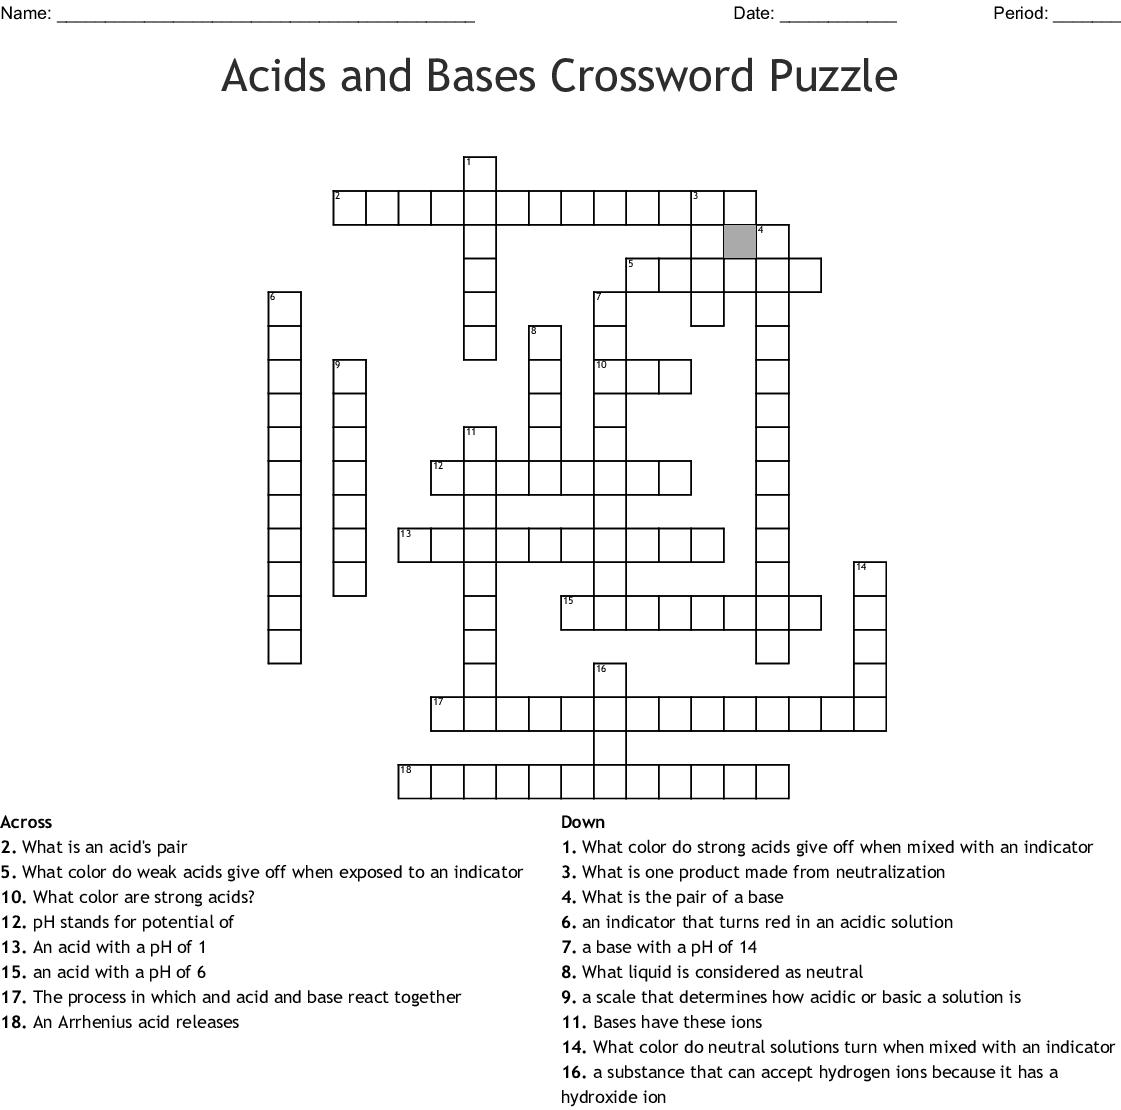 Acids and Bases Crossword - WordMint